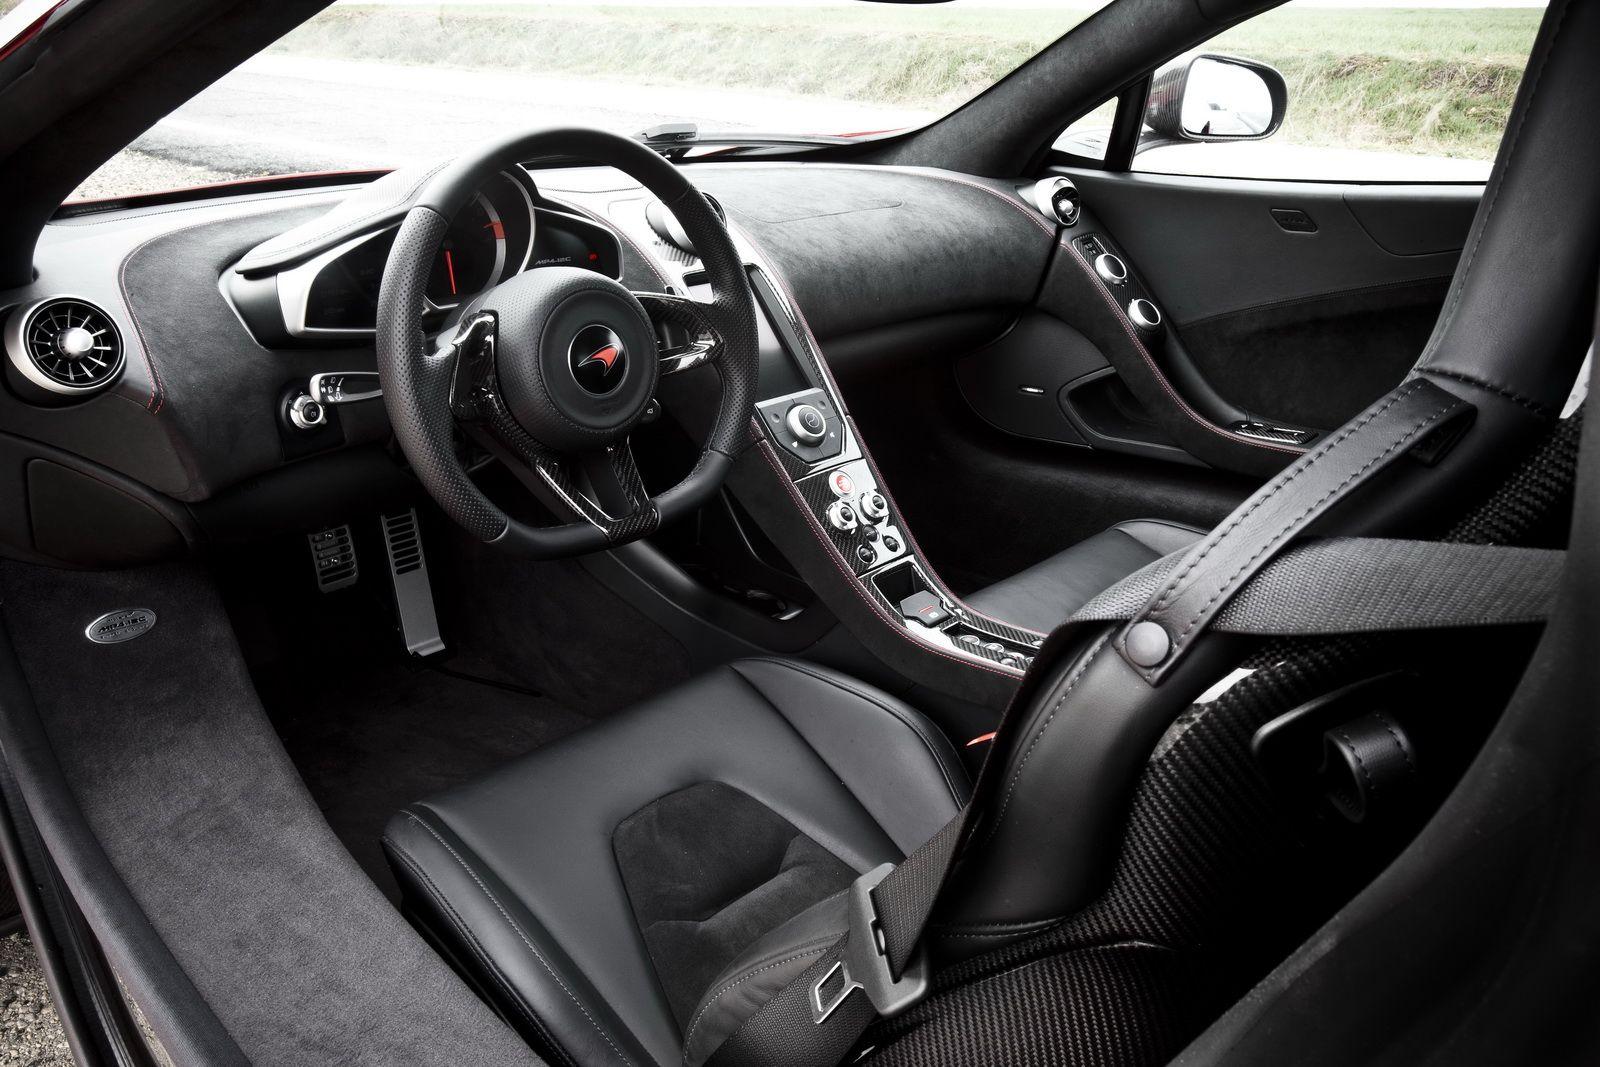 mclaren mp4 interior sports car interiors pinterest mclaren rh pinterest com lego mclaren mp4 12c instructions mclaren mp4 12c owner's manual pdf